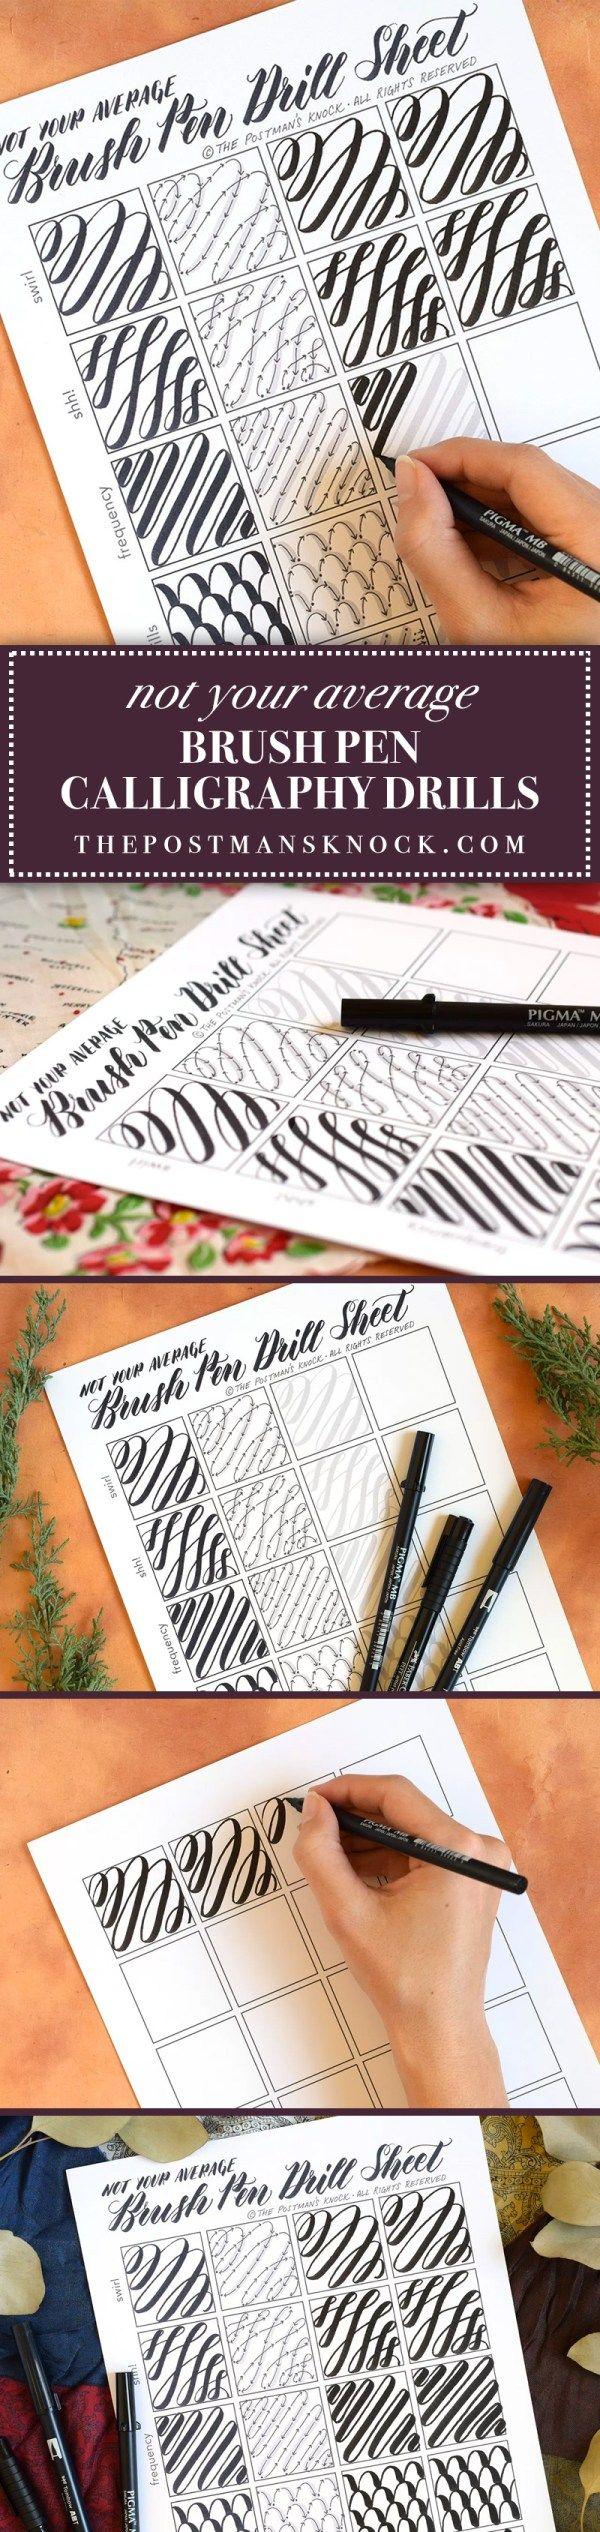 Not Your Average Brush Pen Calligraphy Drills